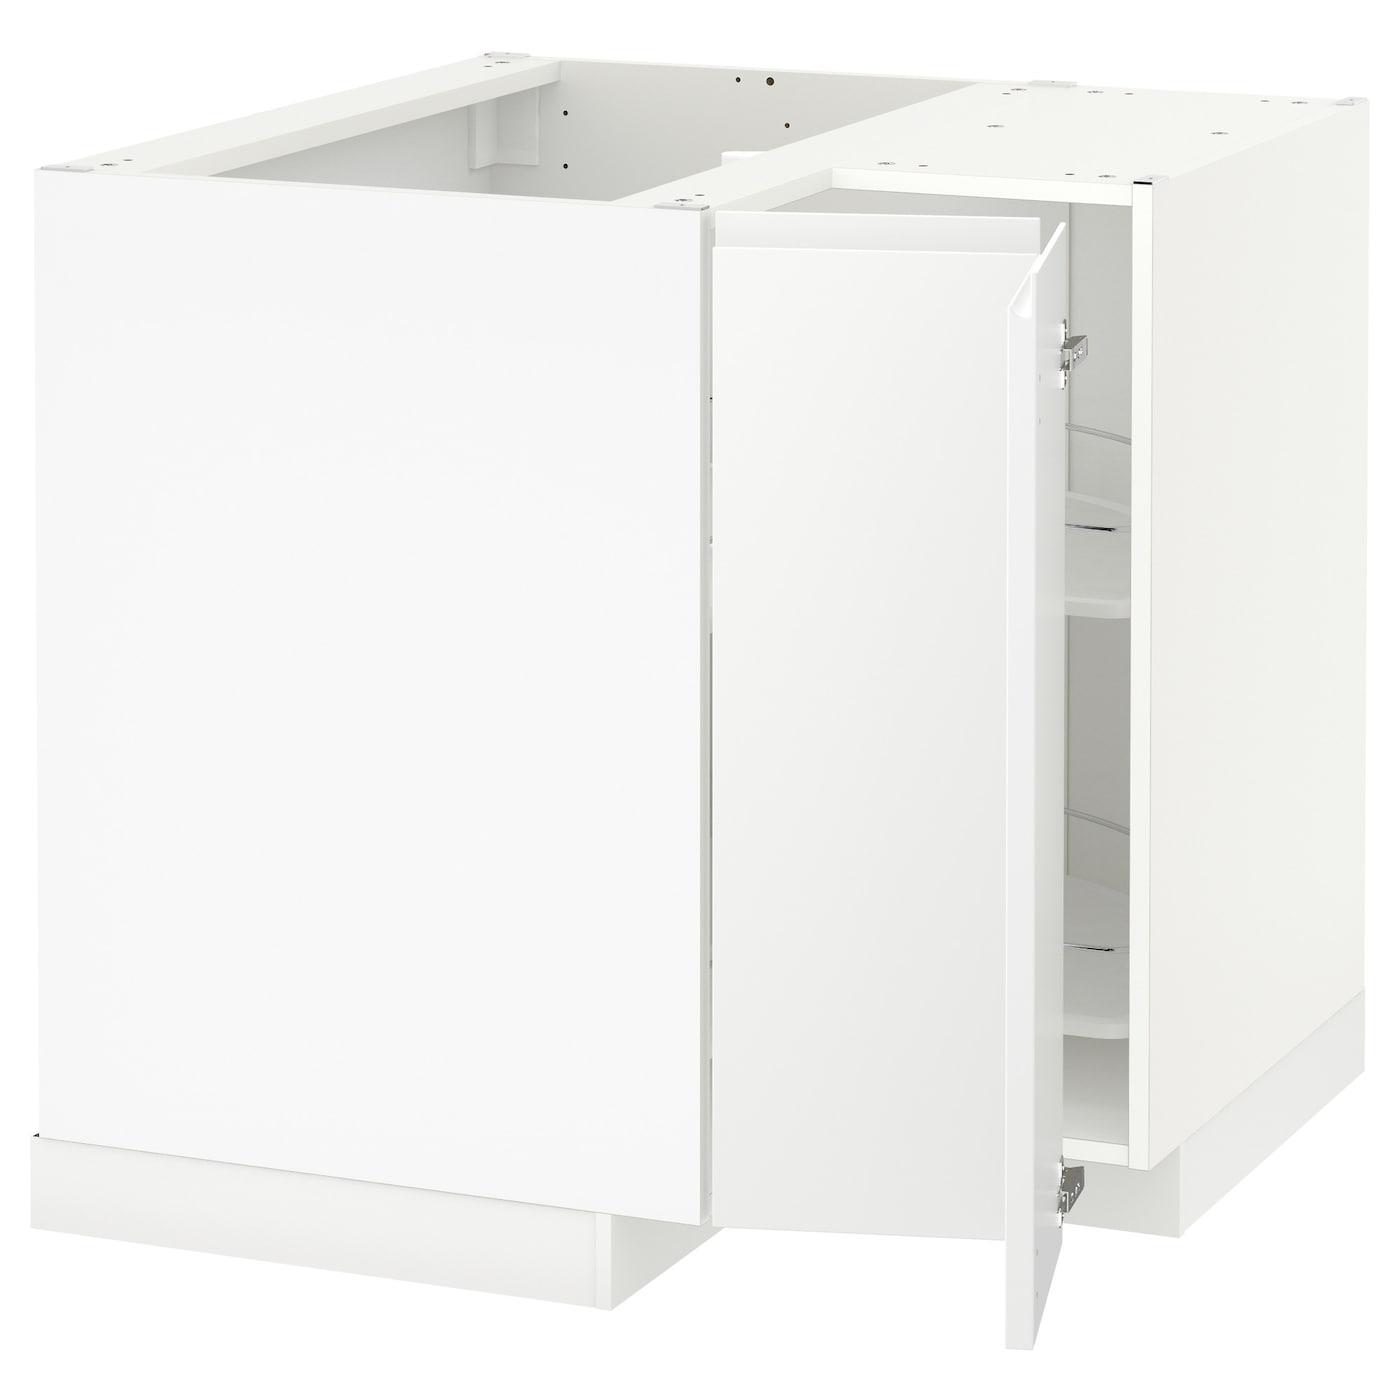 metod onderhoekkast met carrousel wit voxtorp wit 88x88 cm ikea. Black Bedroom Furniture Sets. Home Design Ideas